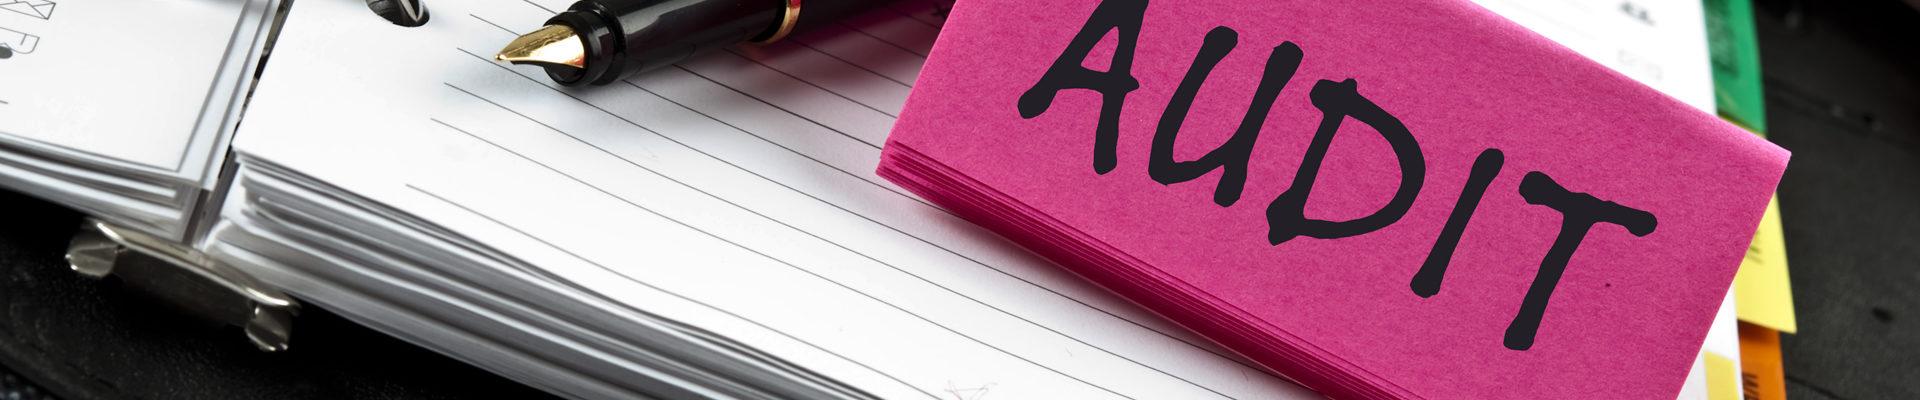 Analytics Configuration & Audit